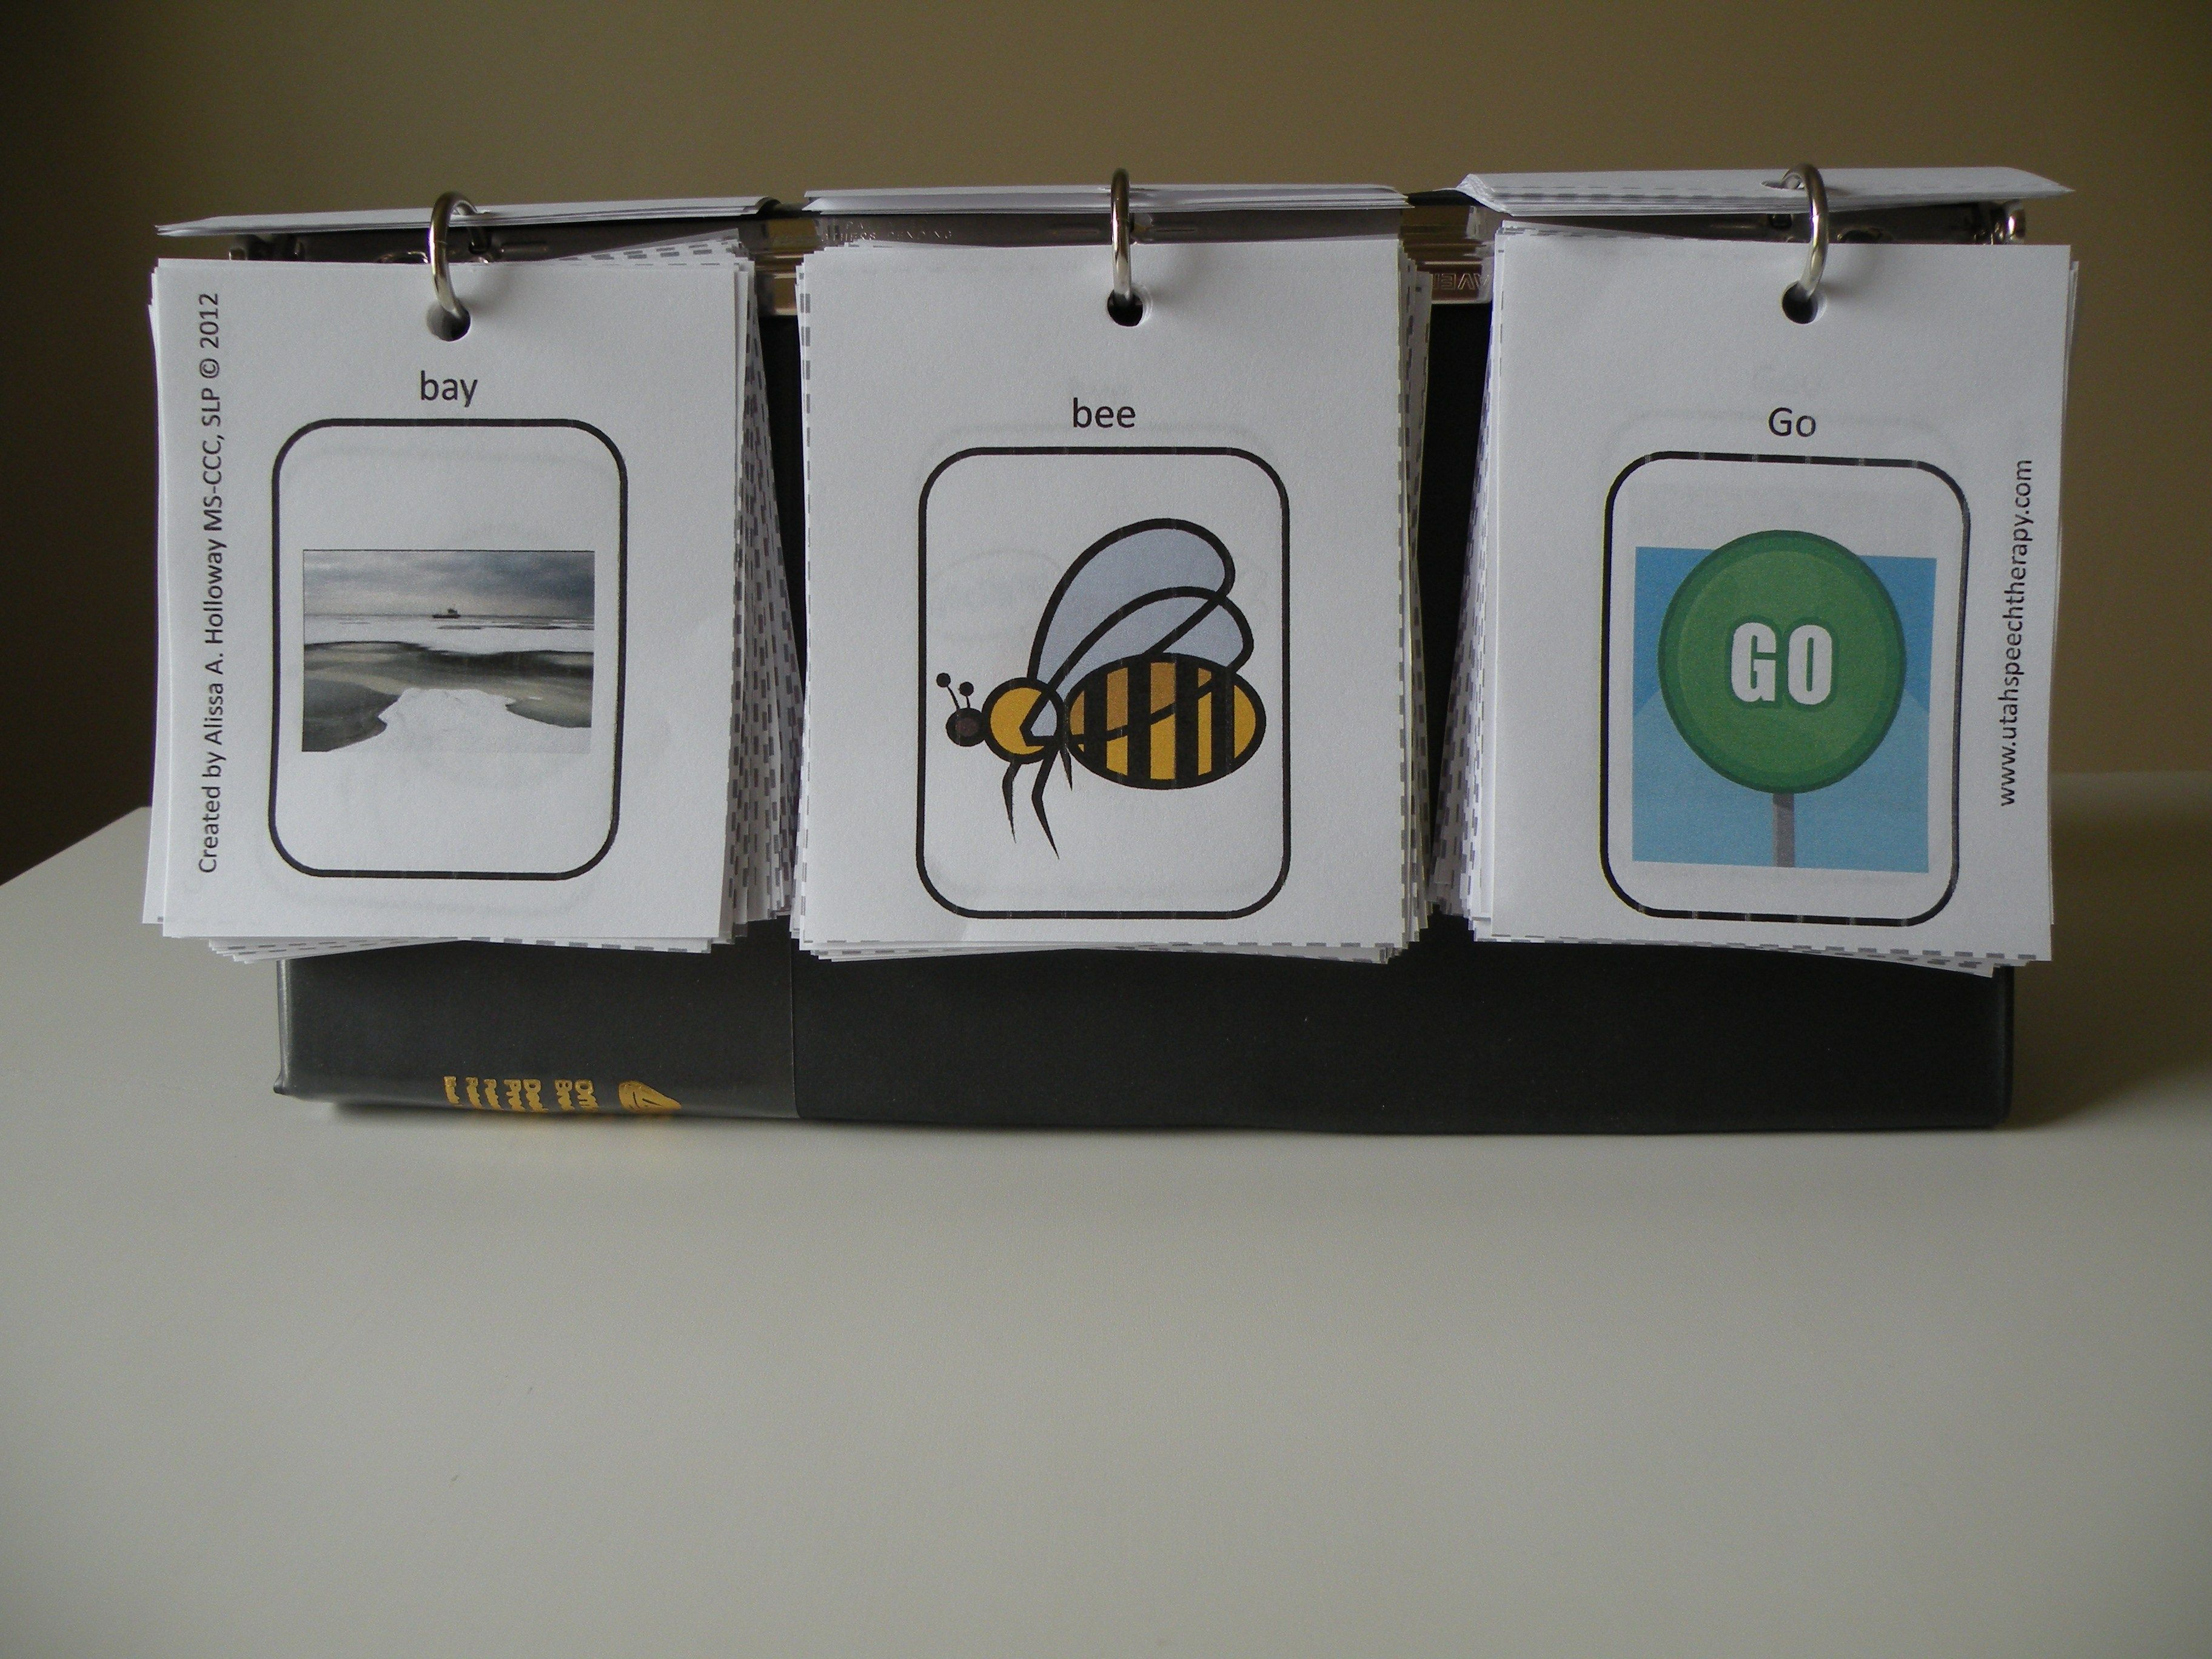 Apraxia Flip Book Cv Combos Apraxia Flip Book 2 Vc Combos Go To Print Setup And Change